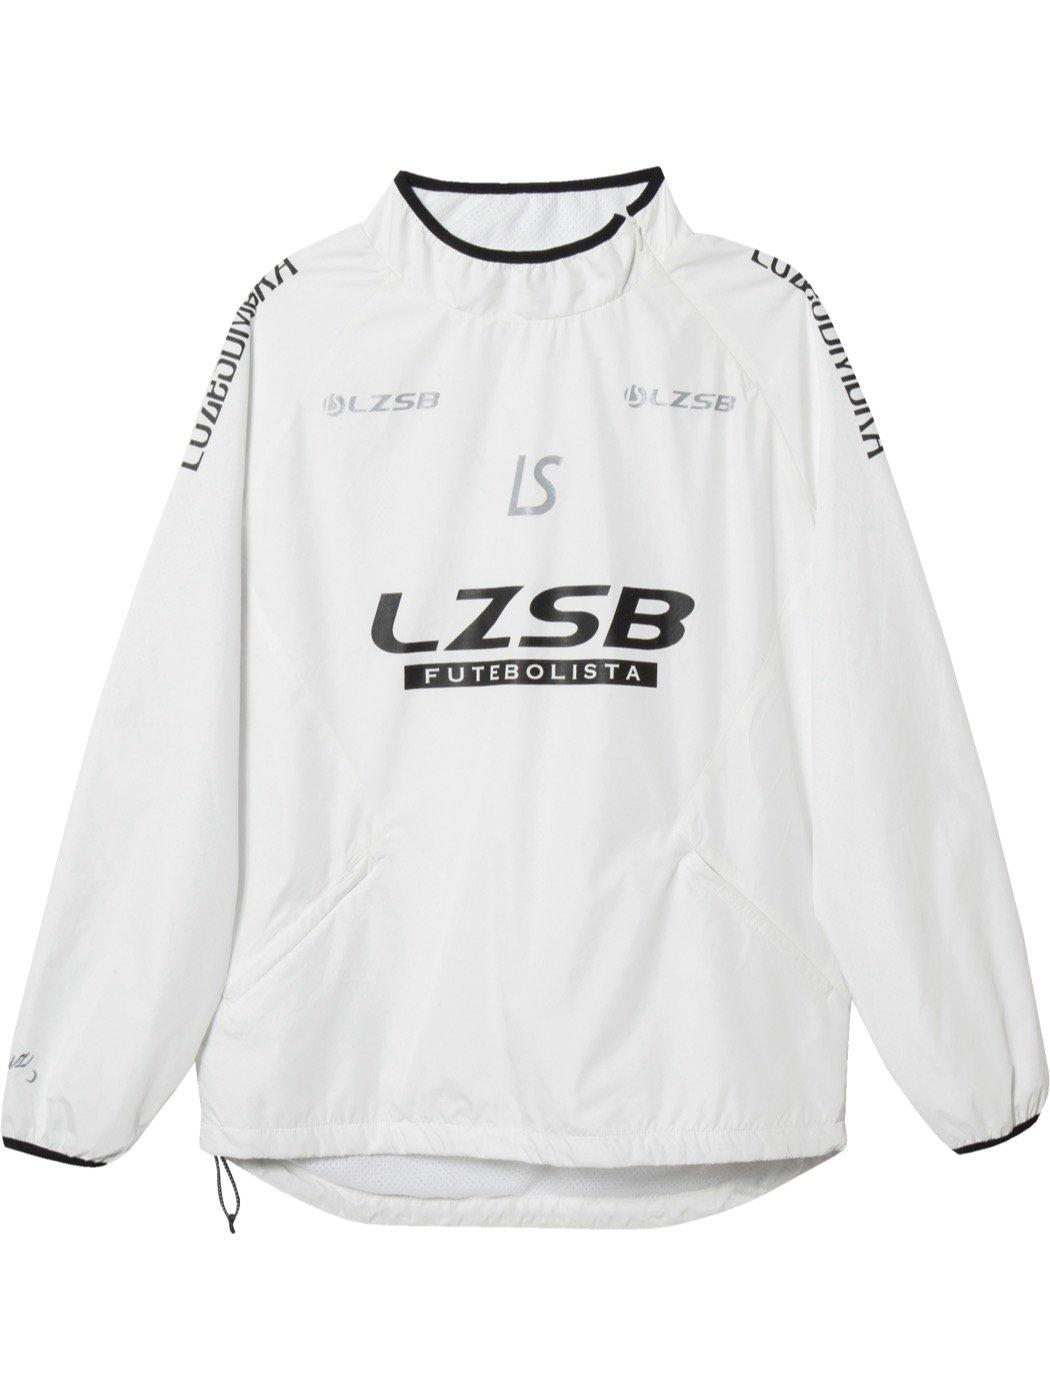 LUZeSOMBRA(ルースイソンブラ) HYBRID タフタトップ F1811104 B079QDTD5N Large|ホワイト ホワイト Large